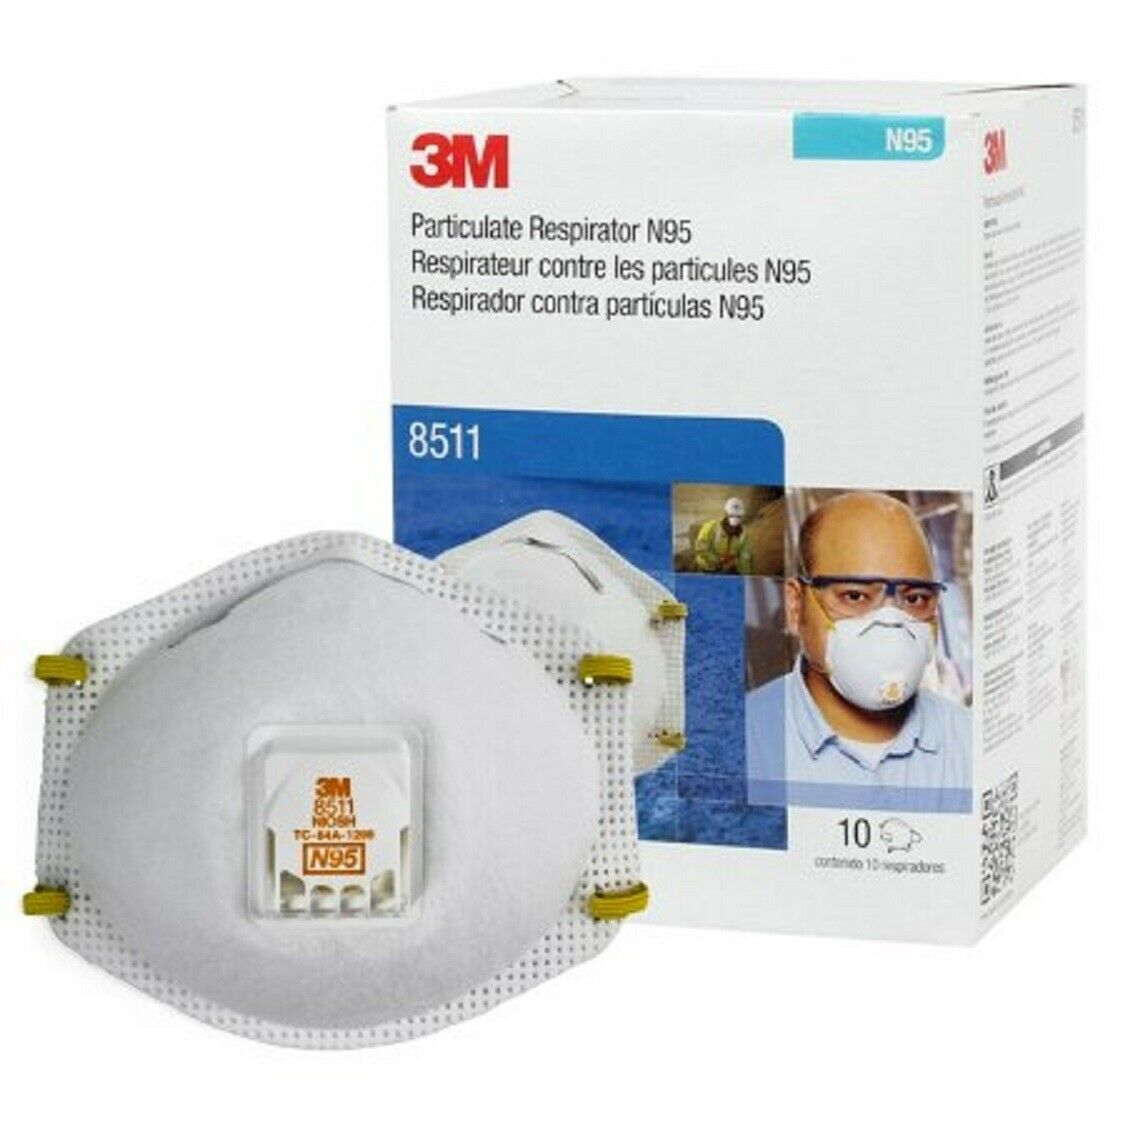 3M8511 Particulat Respiratoor W/ Exhalation Valve, 1- Box of 10, EXP 2/2026 Auto Paints & Supplies